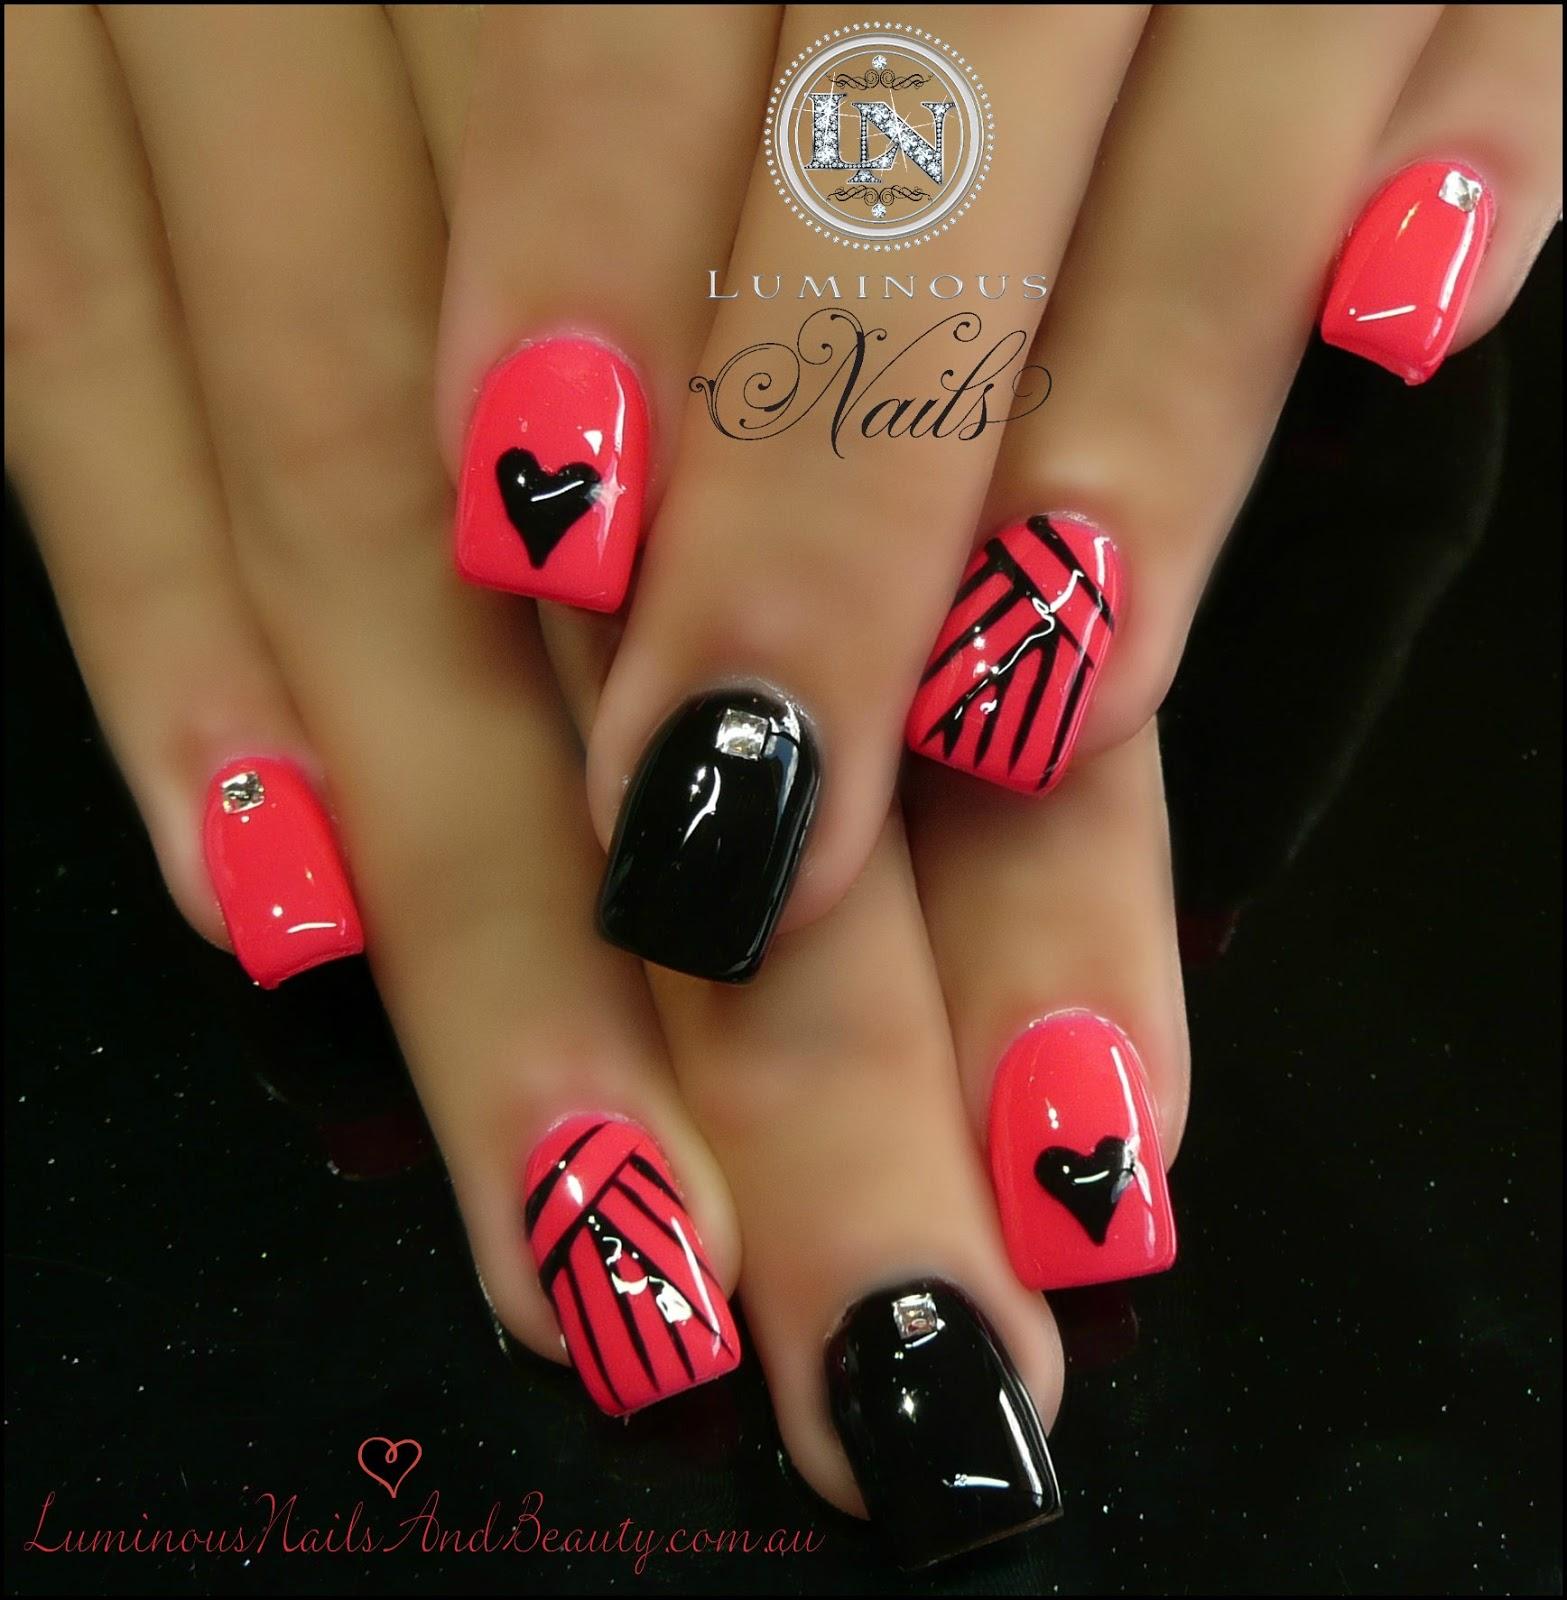 Luminous Nails: March 2013